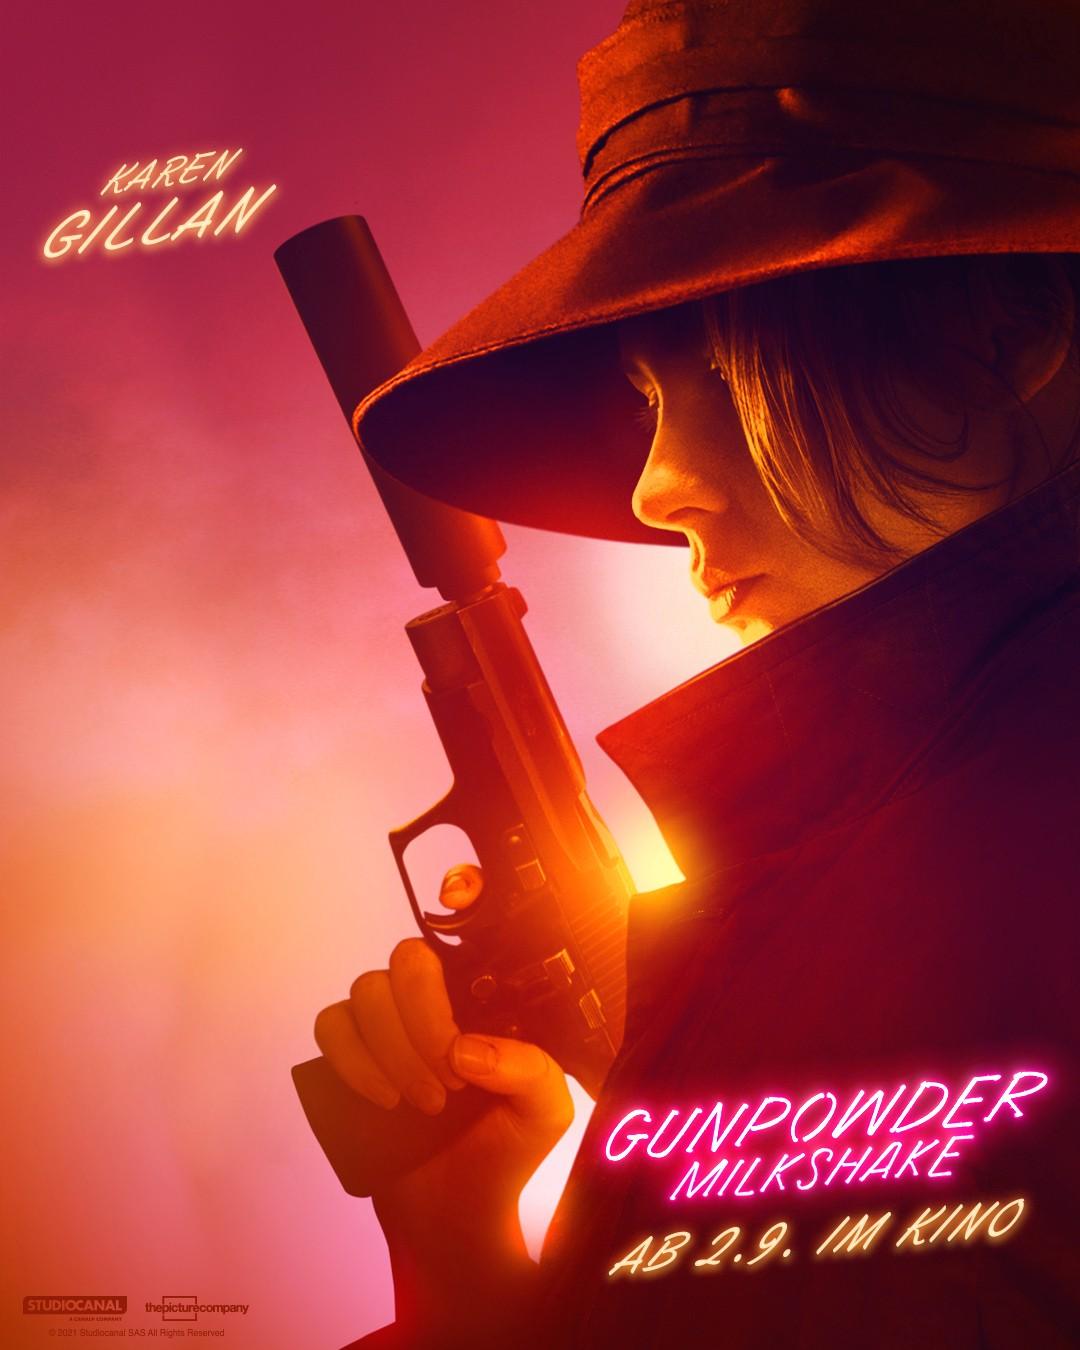 Bild zu Gunpowder Milkshake